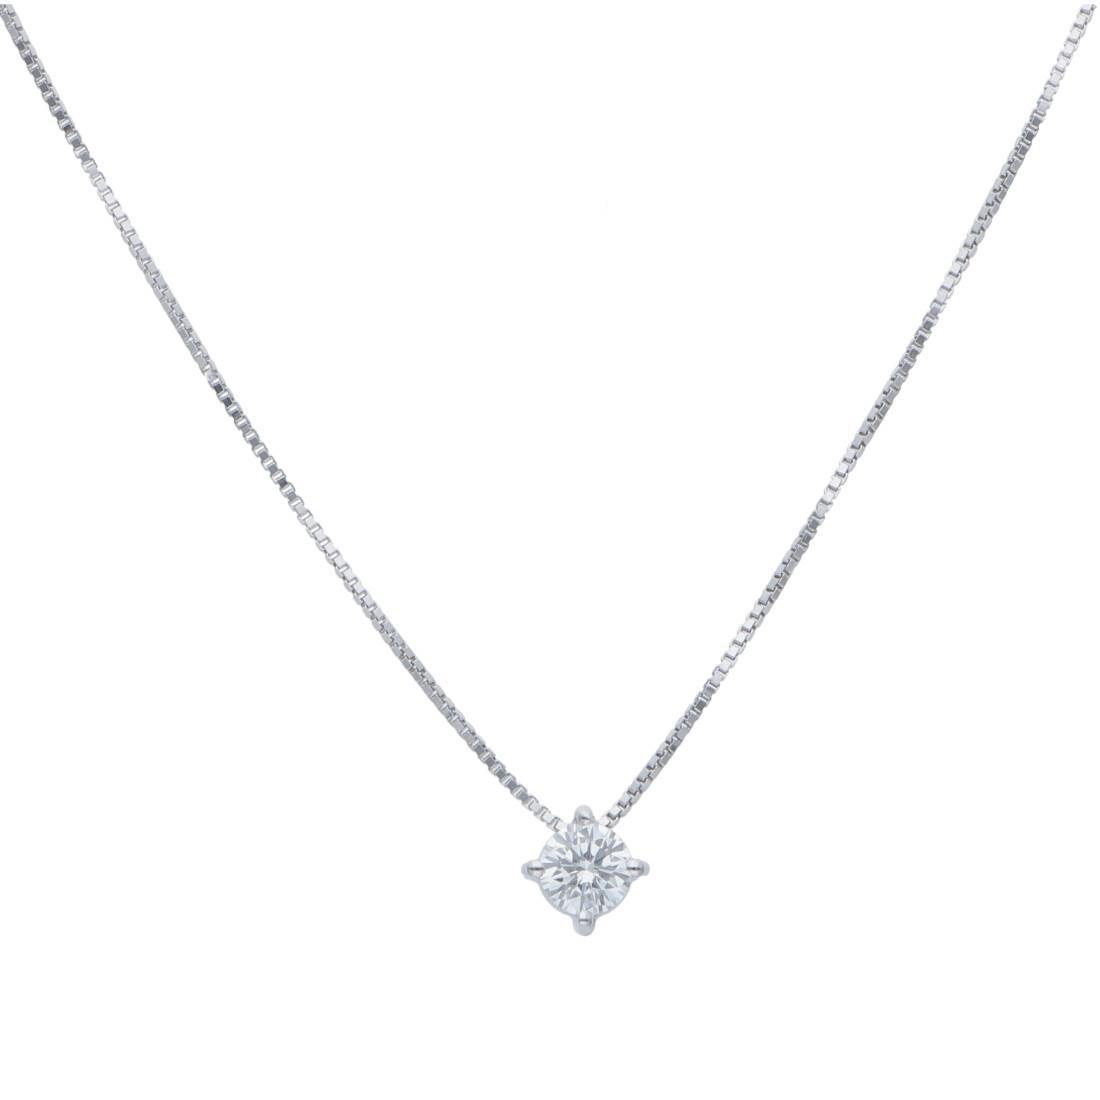 Collana punto luce con diamanti ct 0,06 - ALFIERI & ST. JOHN